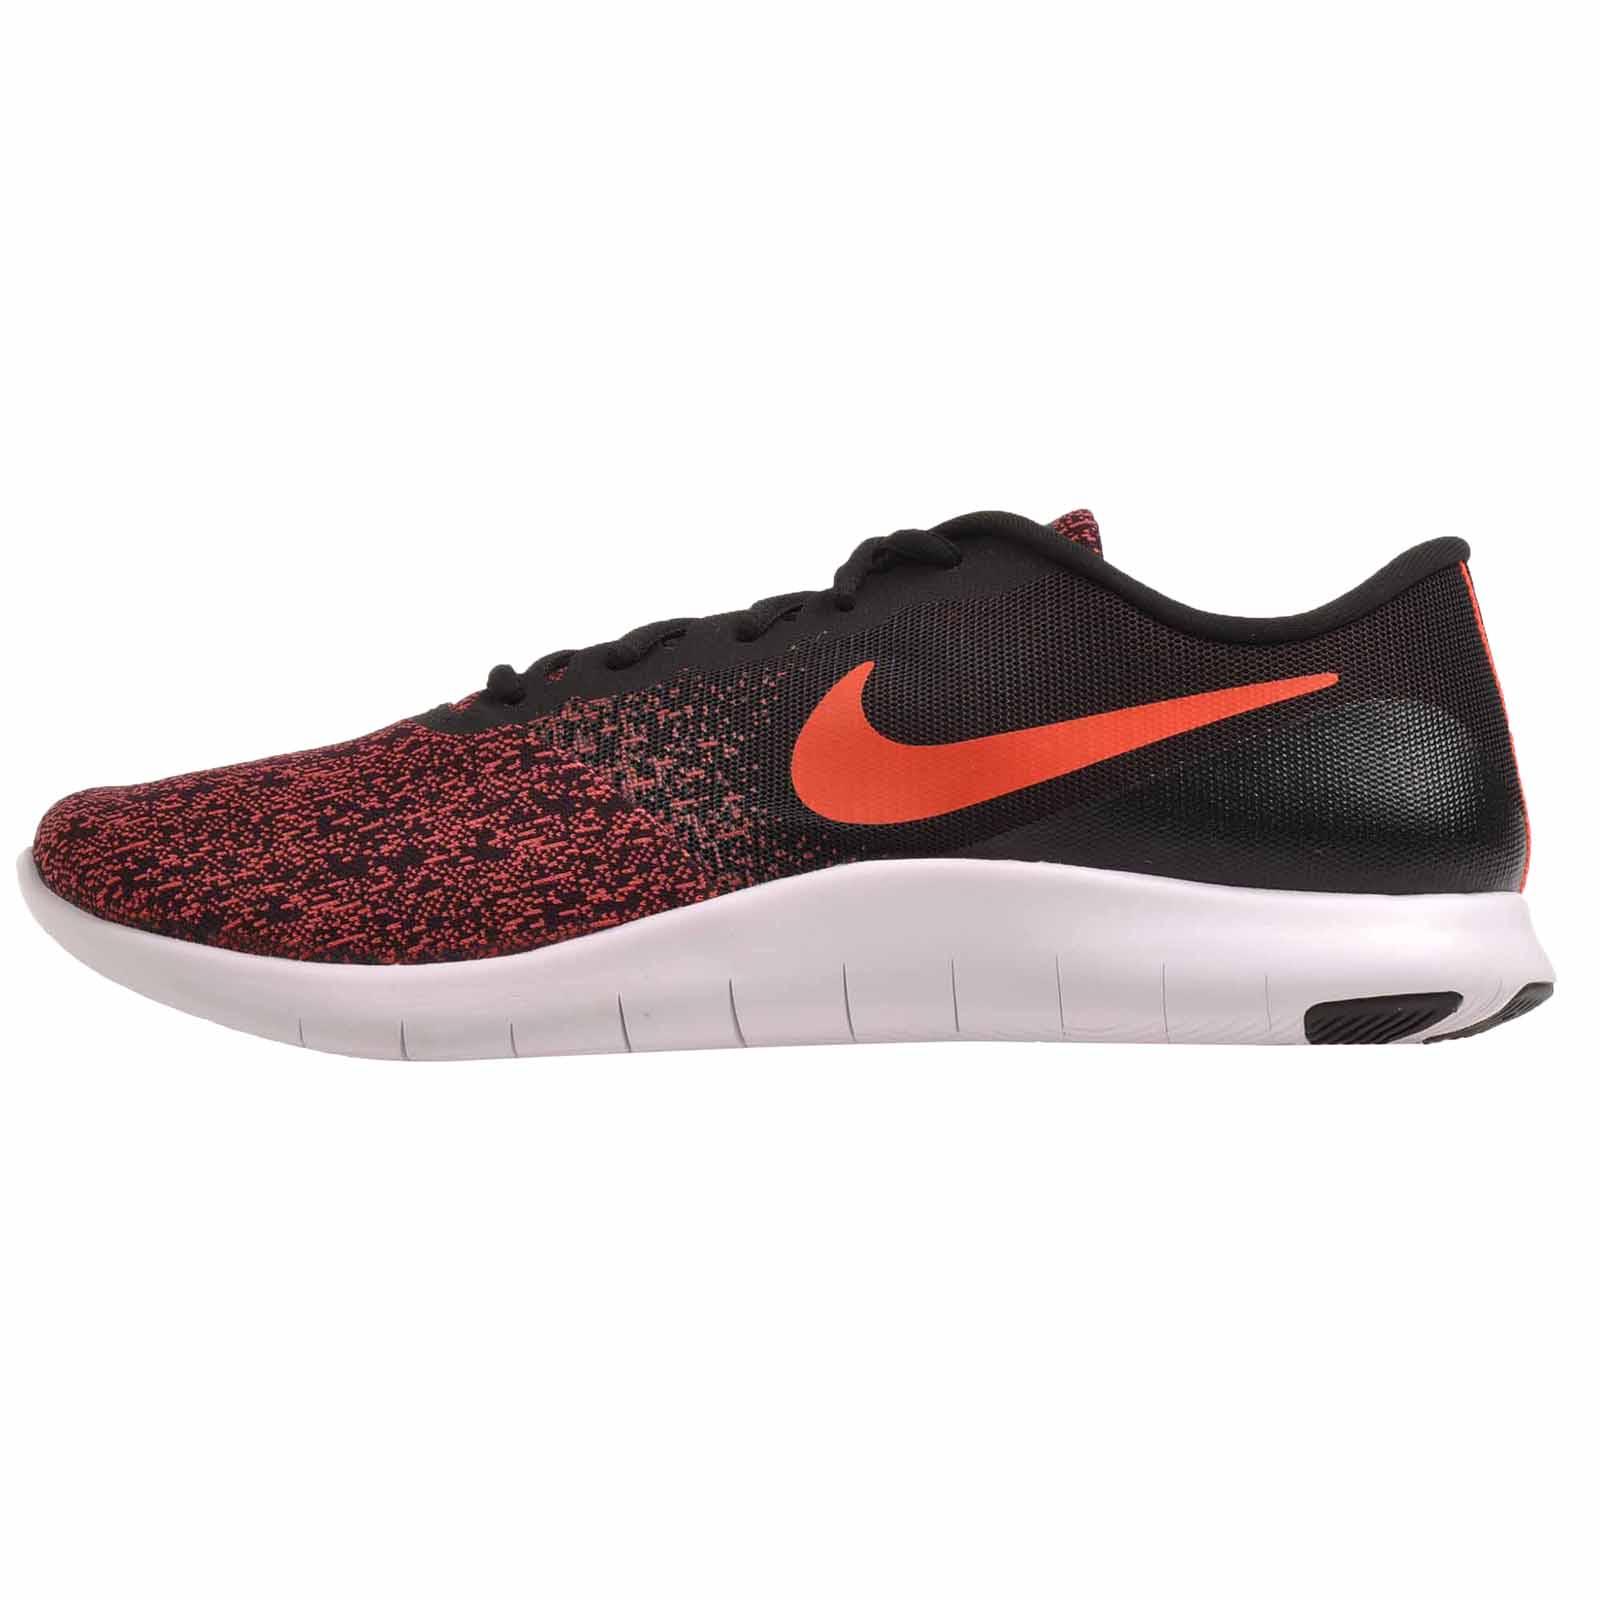 Nike Flex Contact Mens Cross Training Trainers Shoes Black Crimson